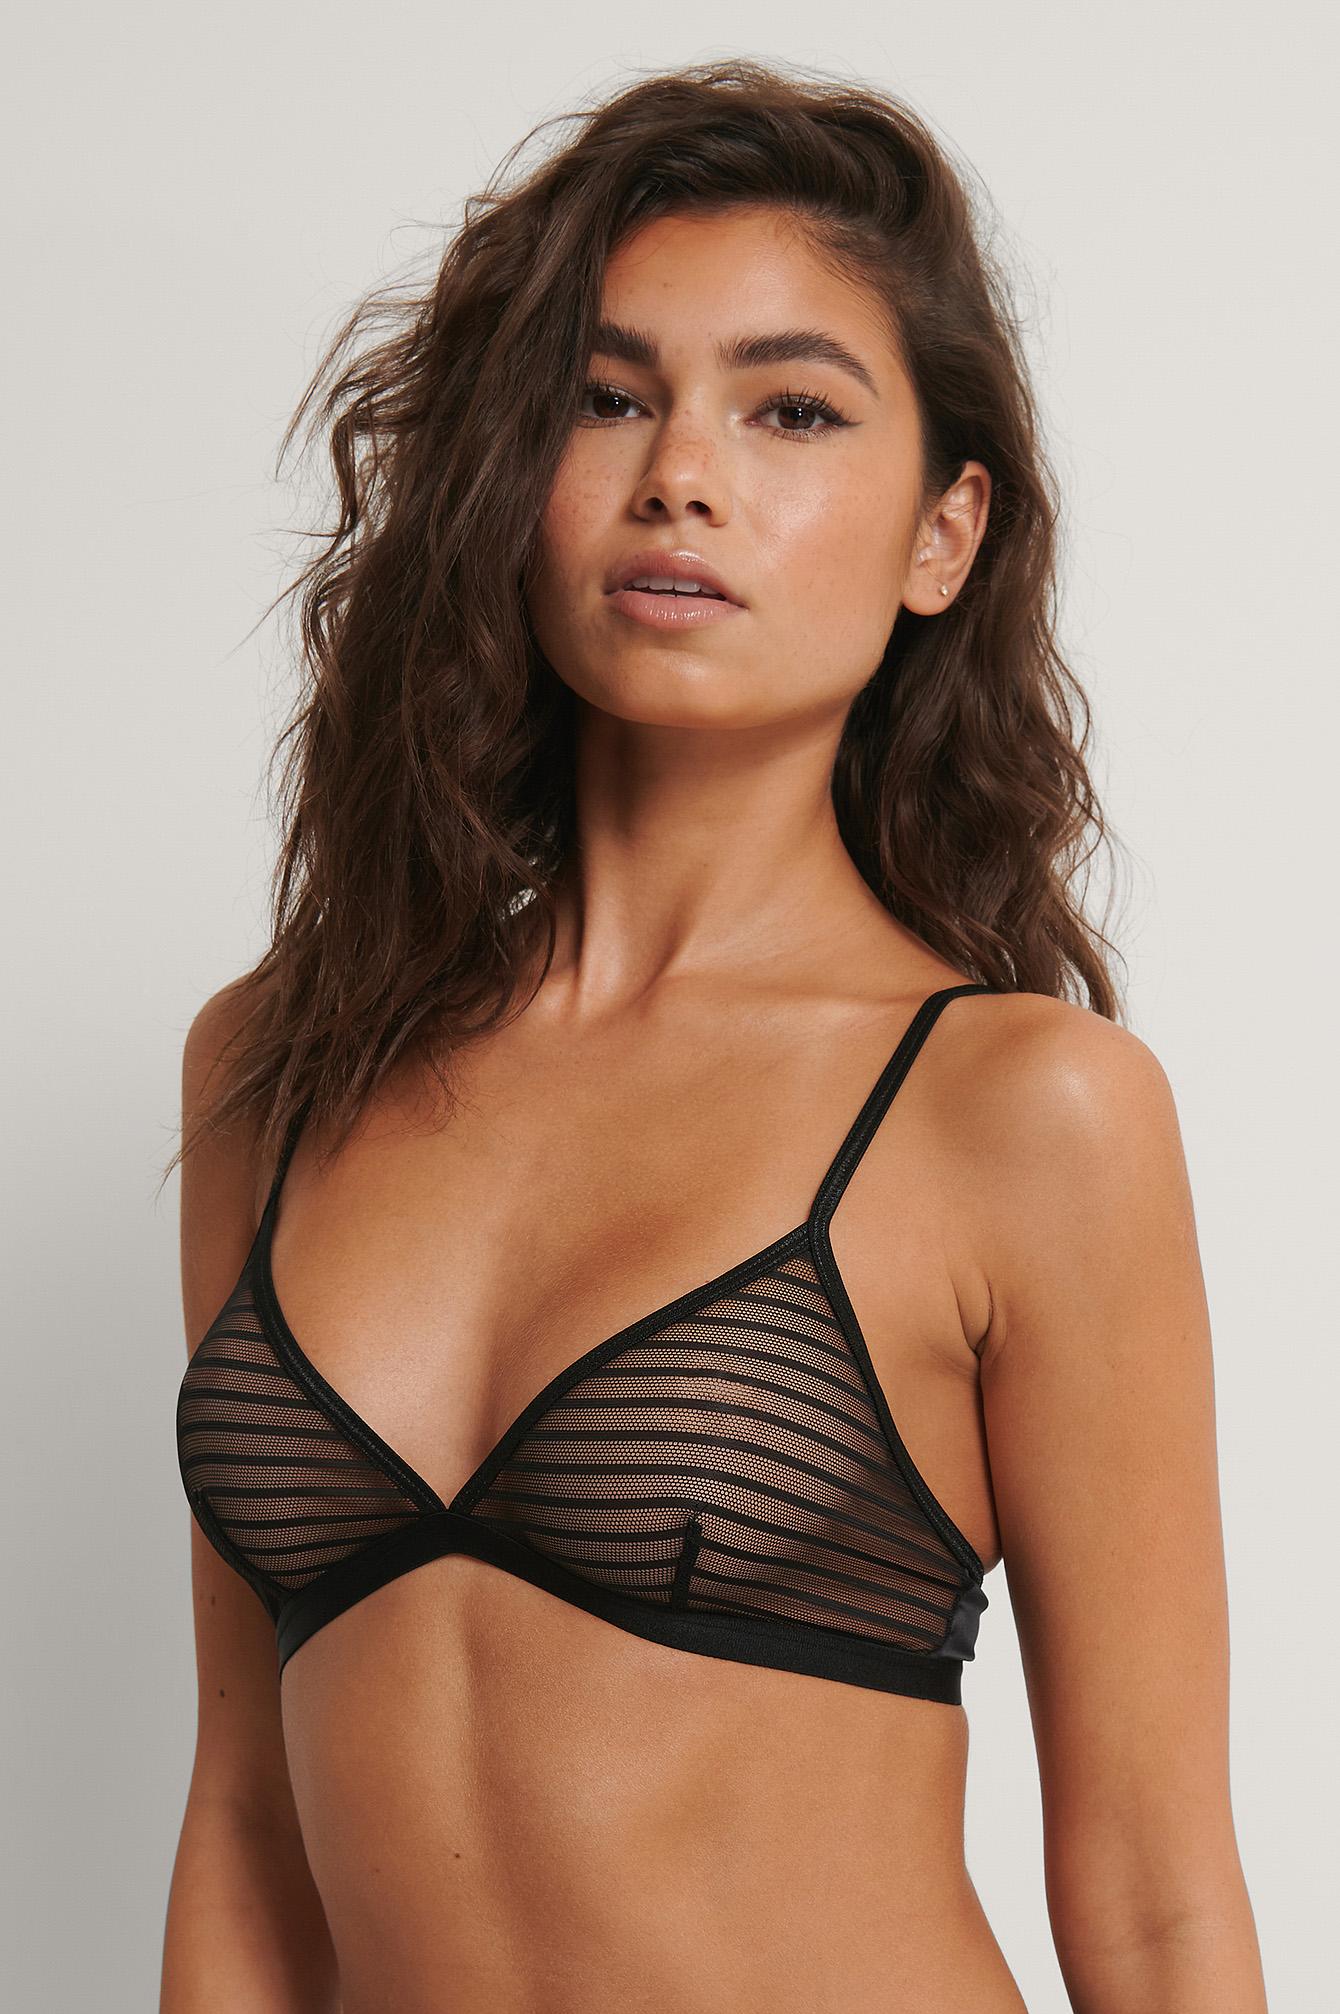 Snake Print Bikini Top | Bikinis, Daily bikini, Printed